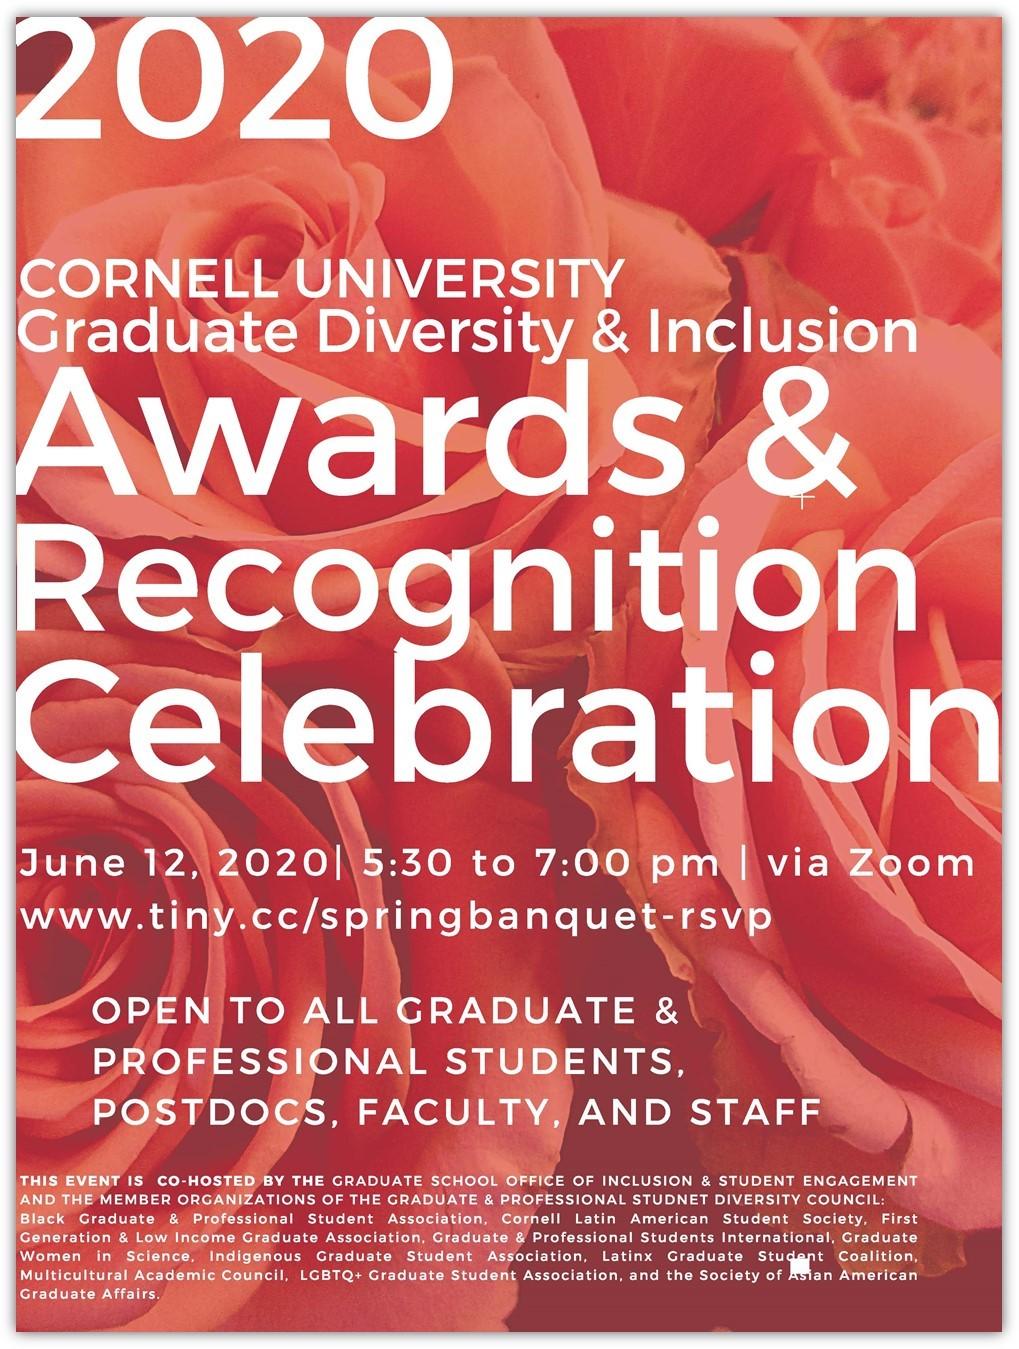 2020 Grad Diversity & Inclusion Award & Recognition Celebration